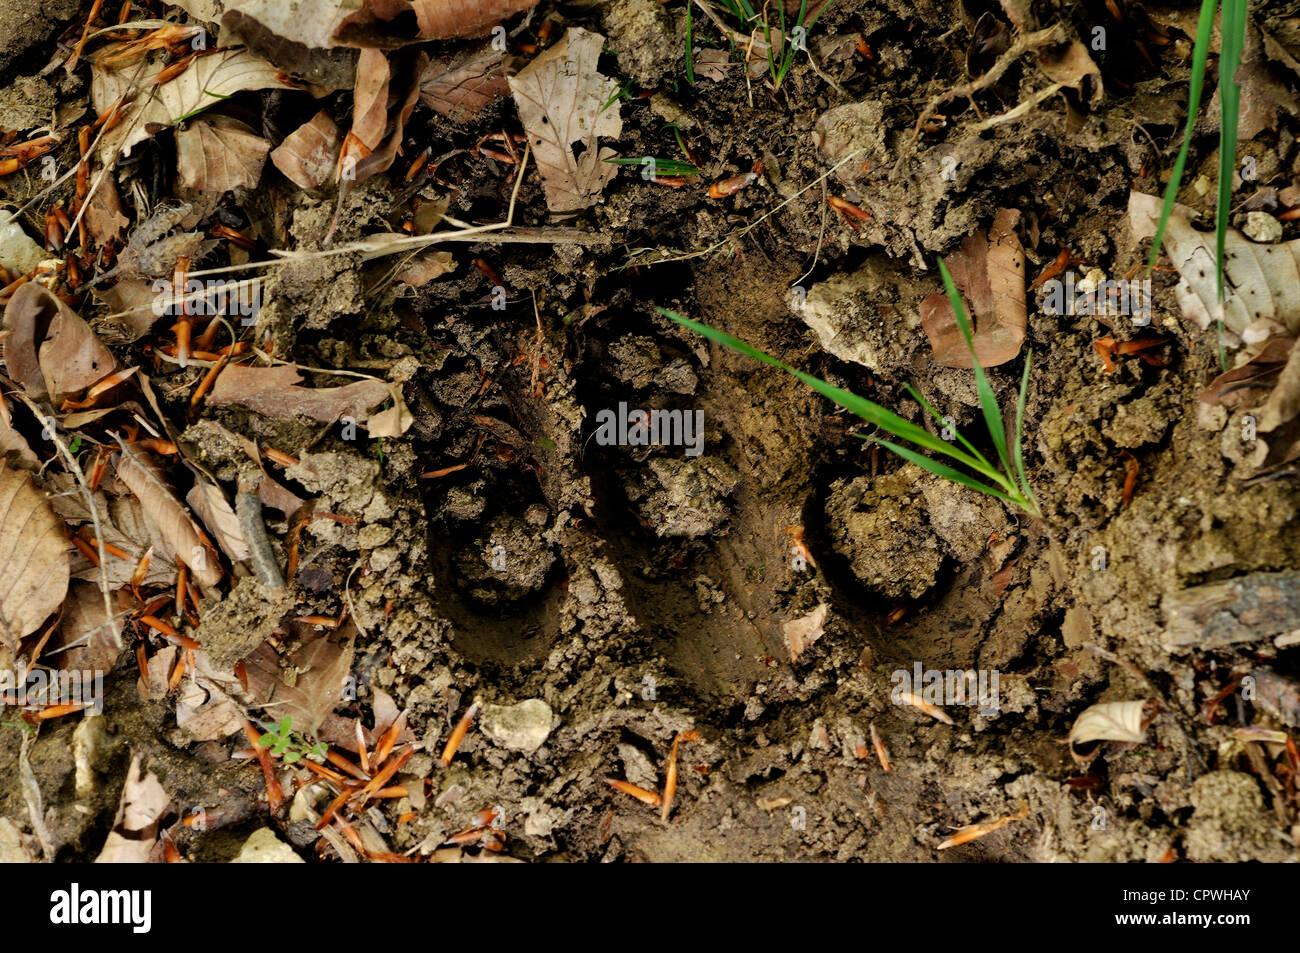 Footprint of Marsicanus brown bear (Ursus arctos marsicanus) in the Abruzzo National Park, Italy - Stock Image